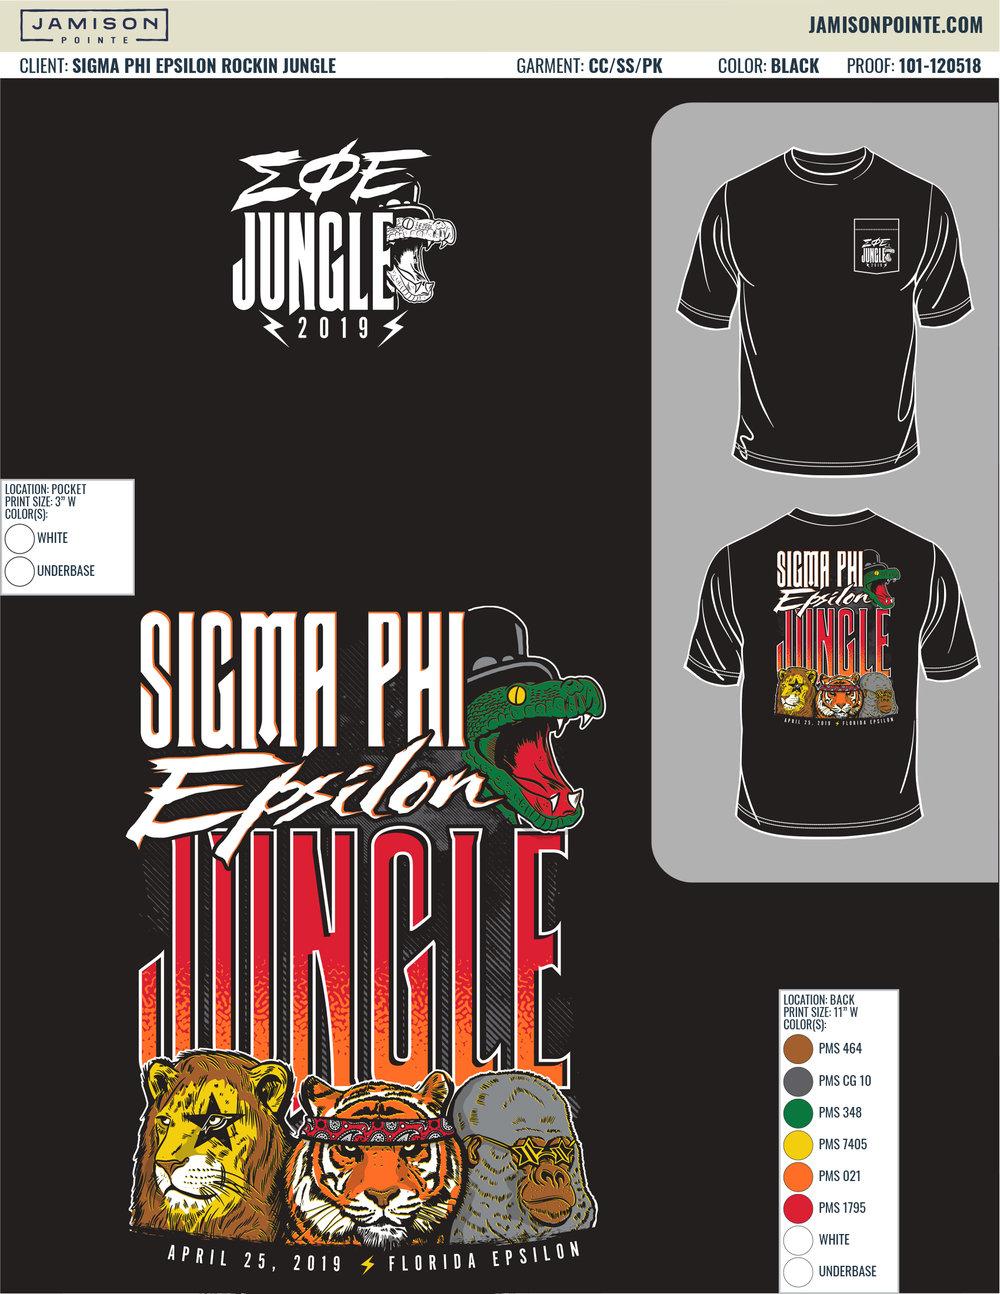 101-120518 Sigma Phi Epsilon Rockin Jungle.jpg